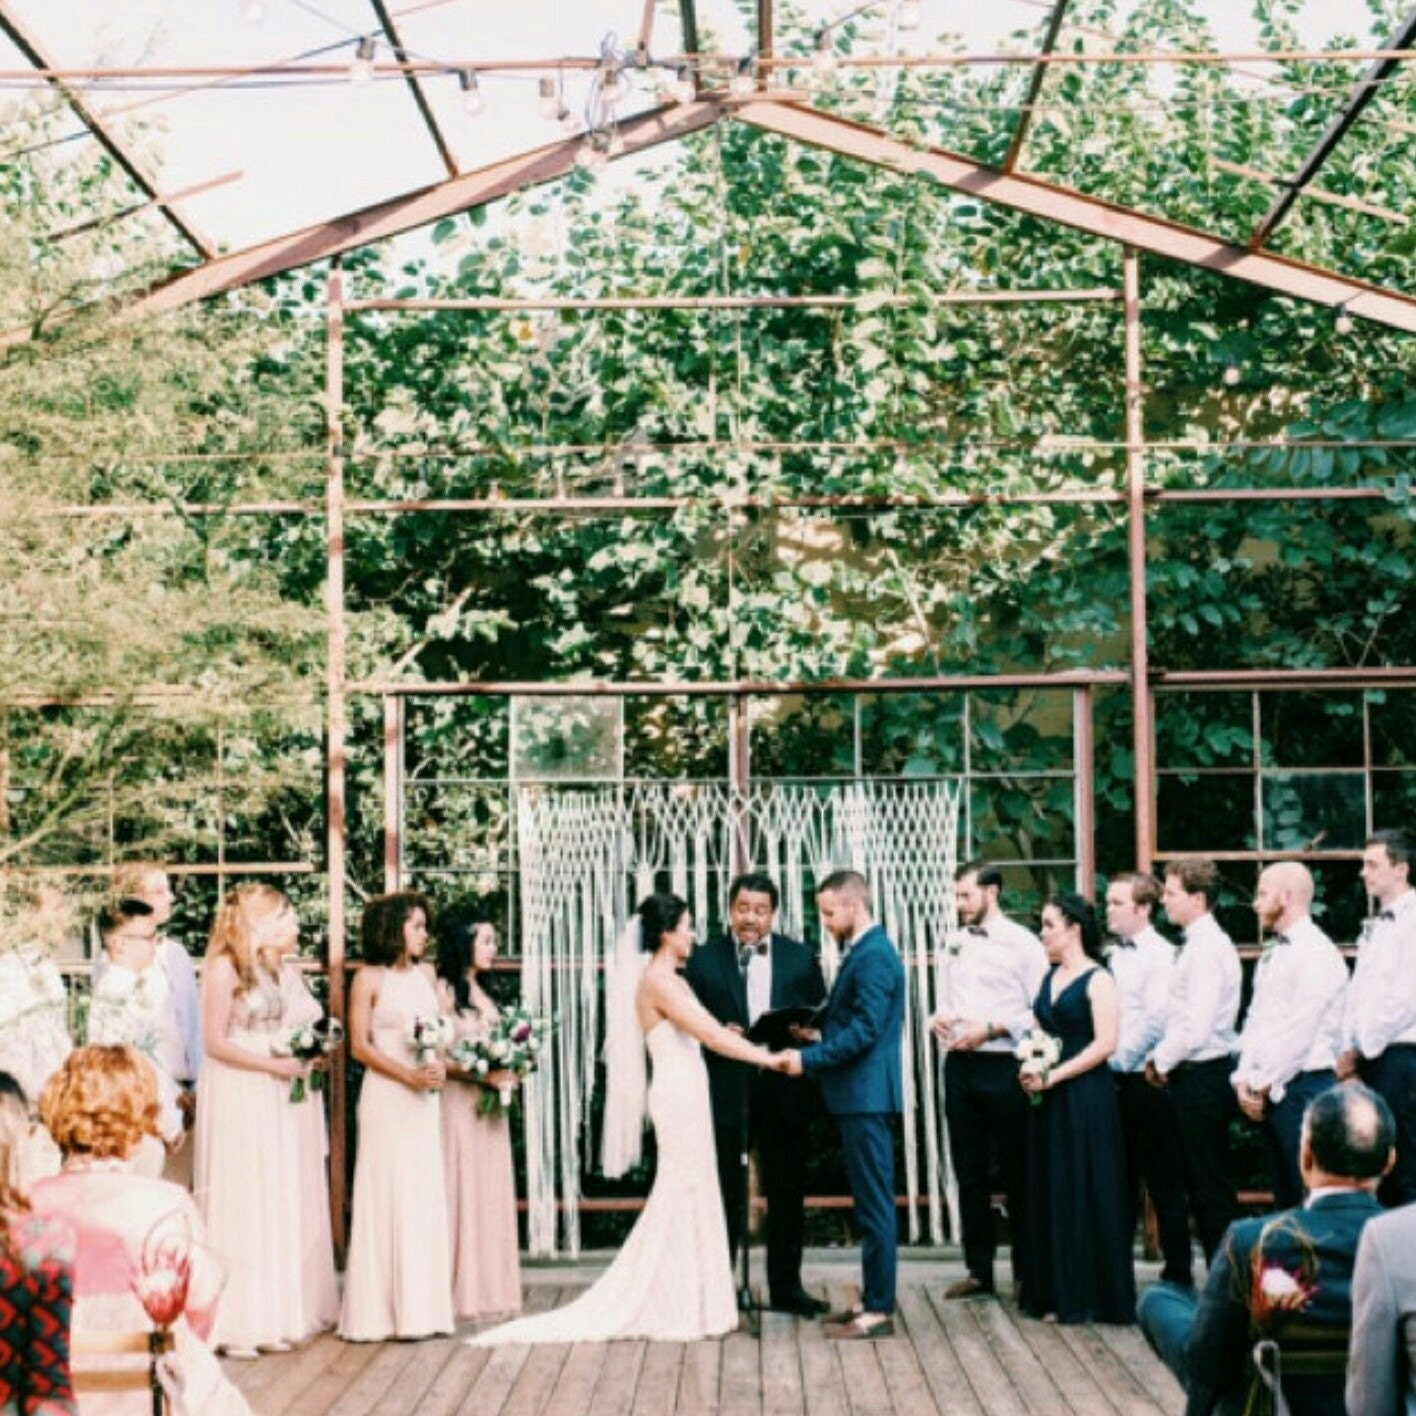 Macramae Ideas Wedding Arch: Boho Wedding Arch For Altar Or Home Decor. Unique Macrame